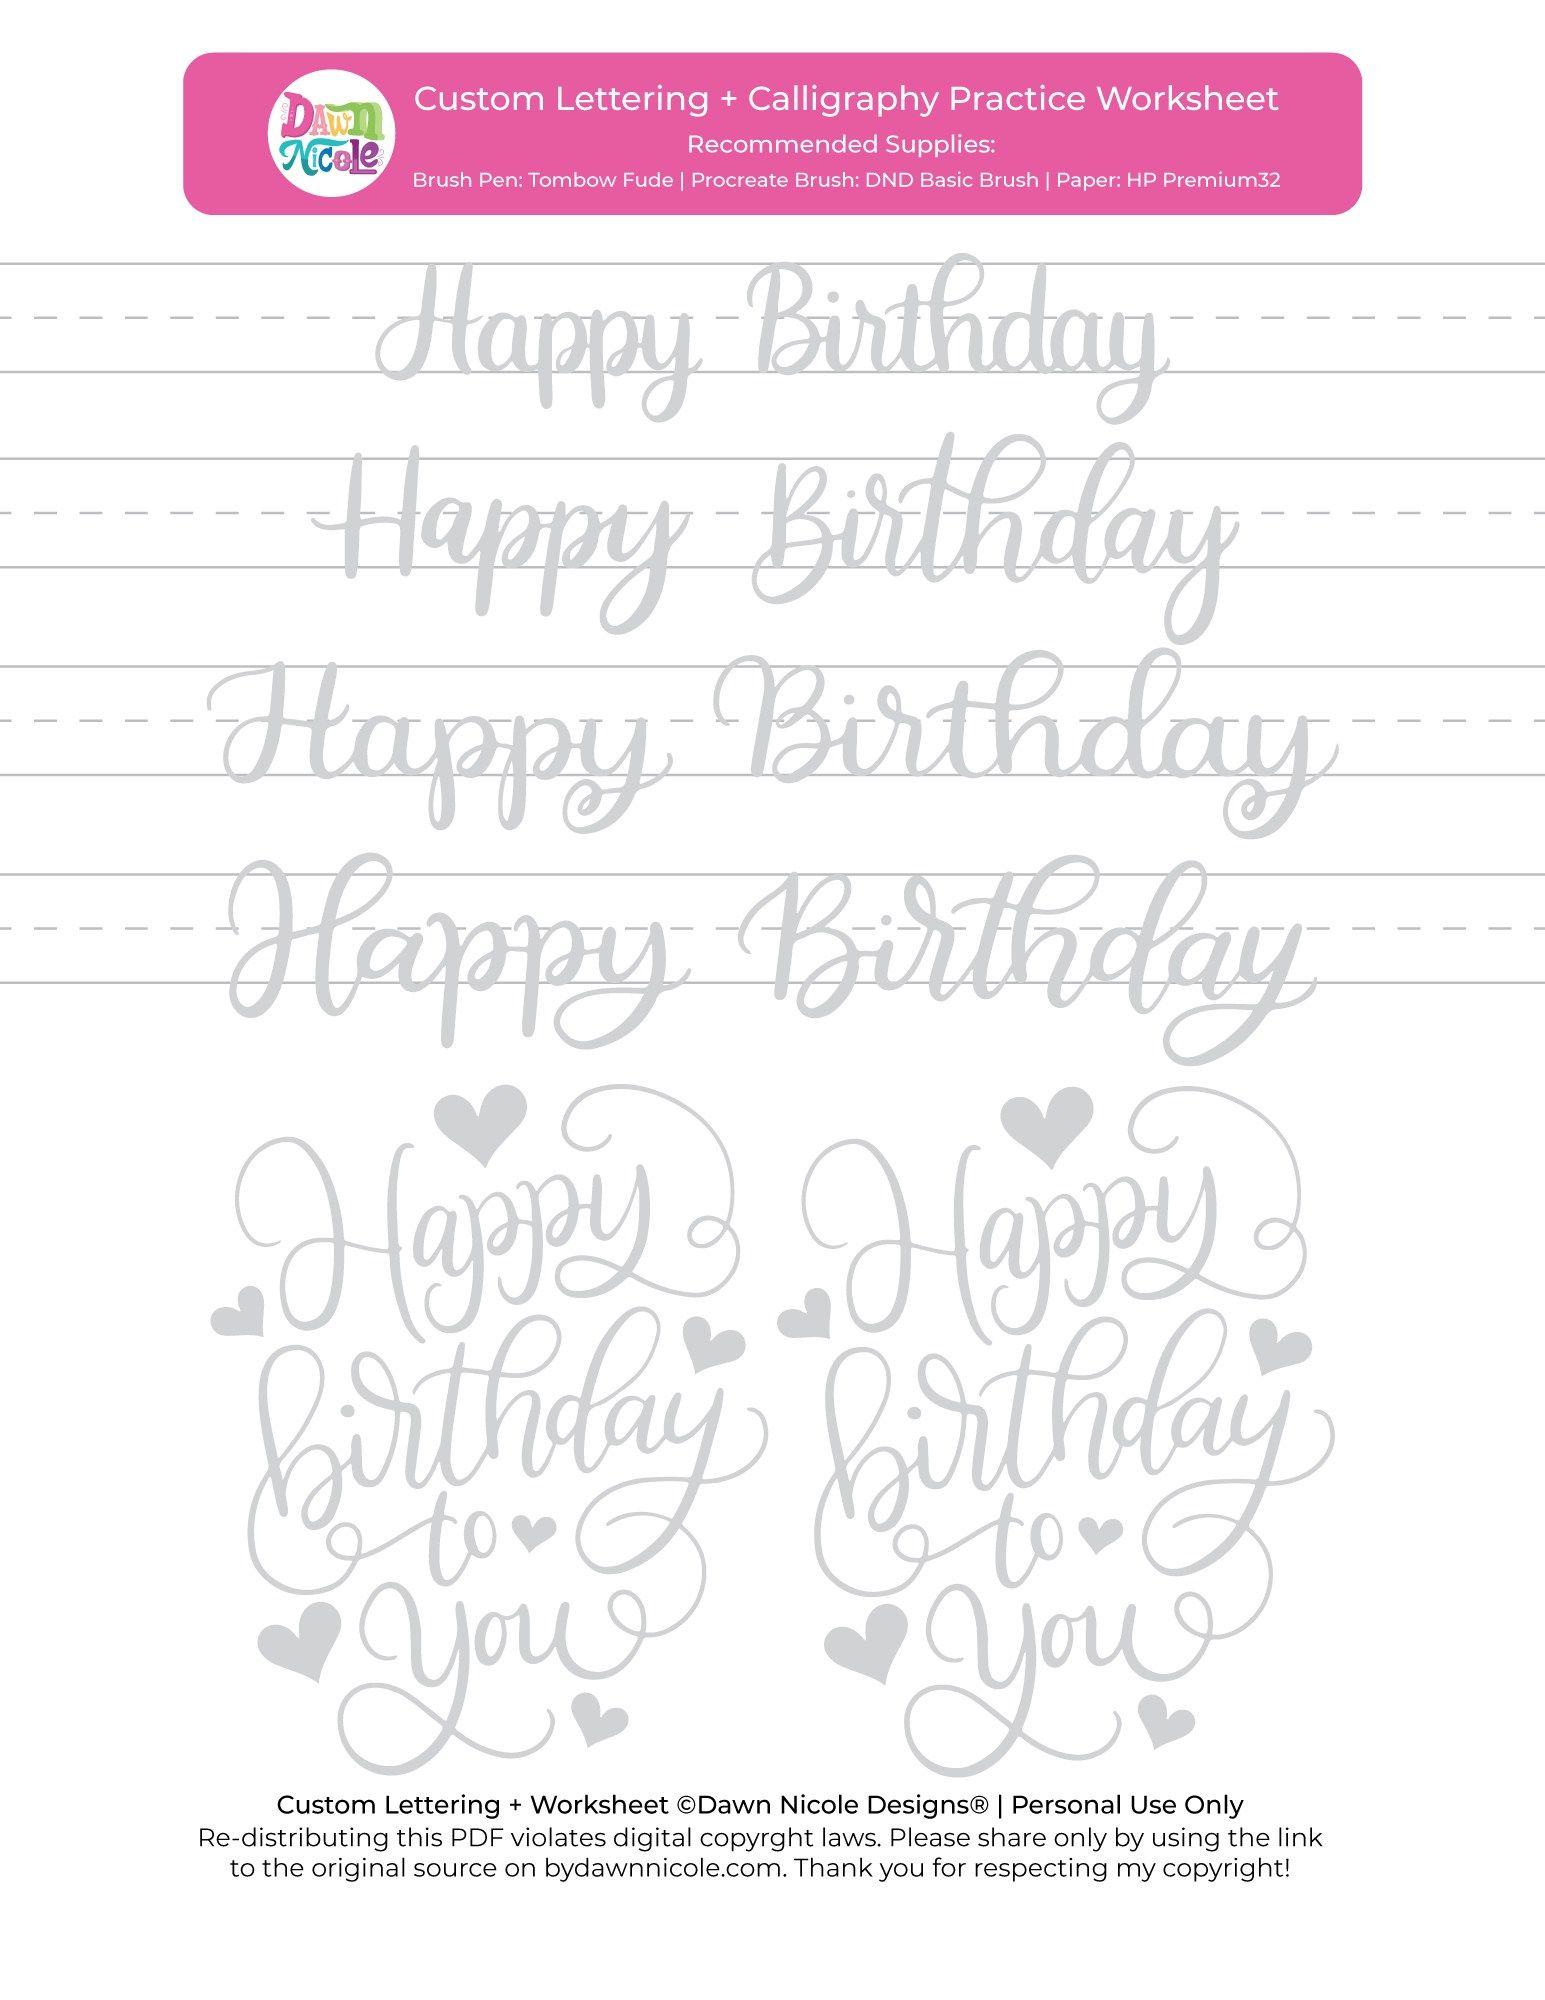 Happy Birthday Brush Calligraphy Practice Sheets In